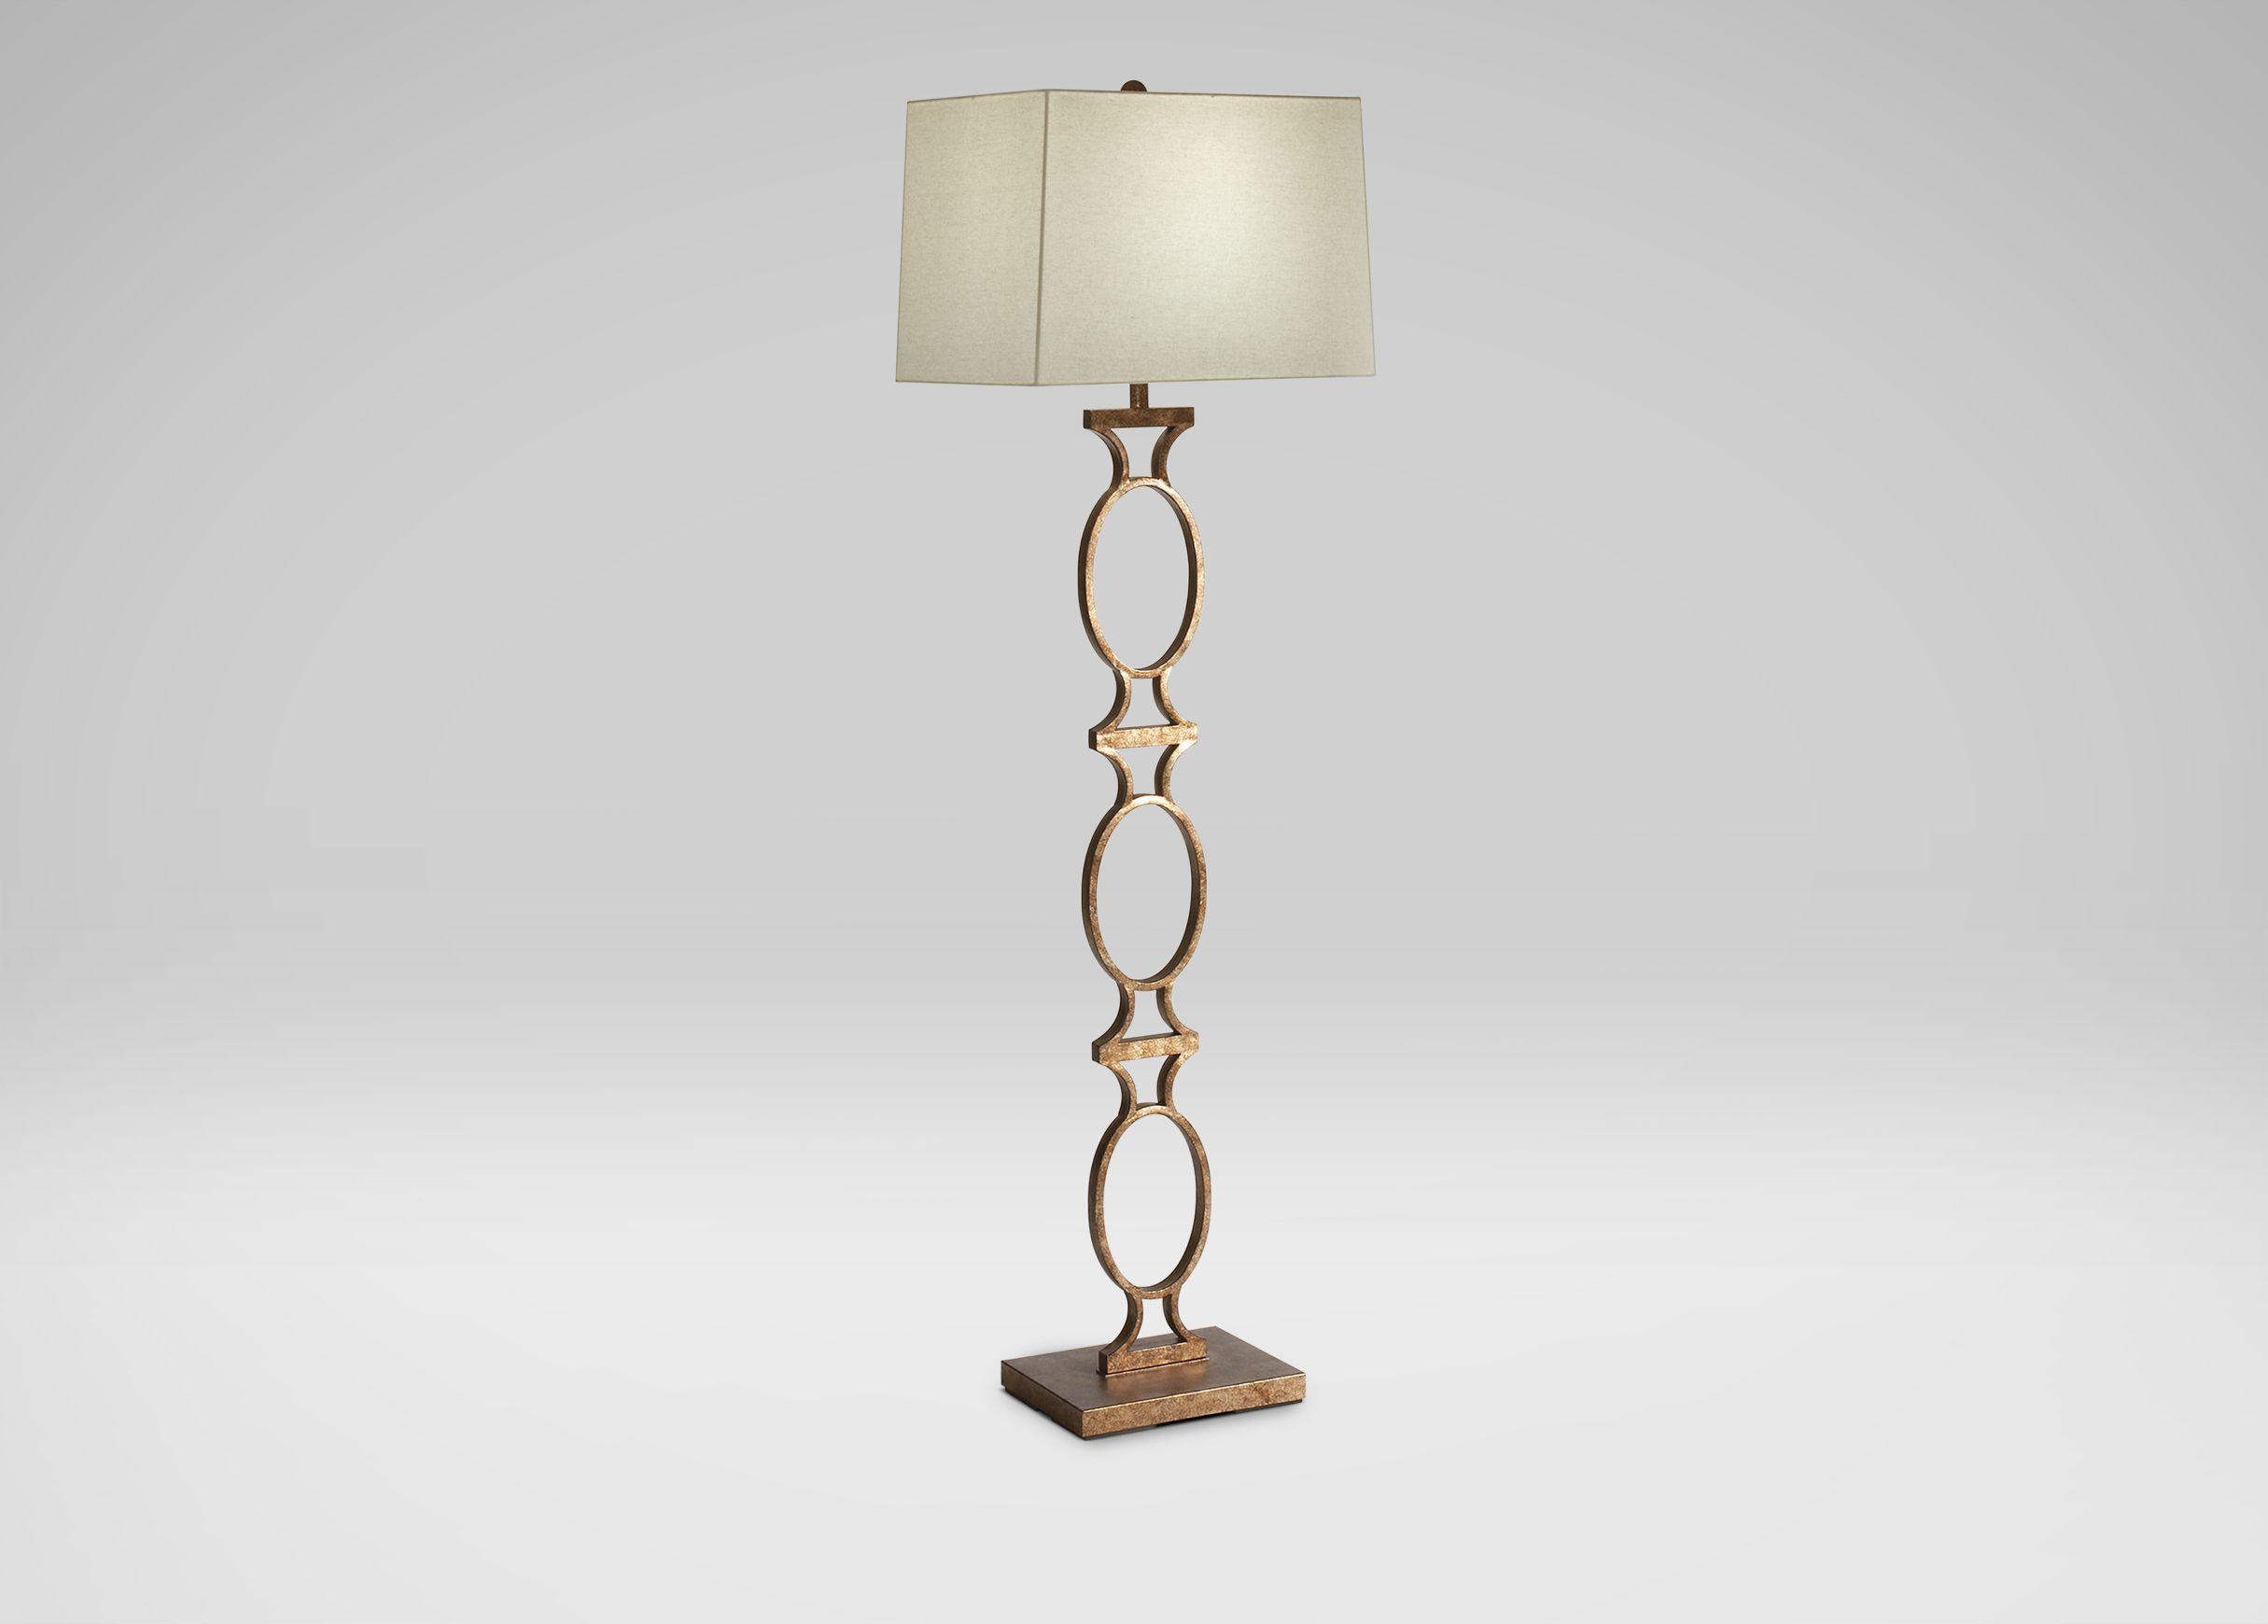 Owen ringed floor lamp ethan allen arcadia entry study owen ringed floor lamp ethan allen aloadofball Gallery